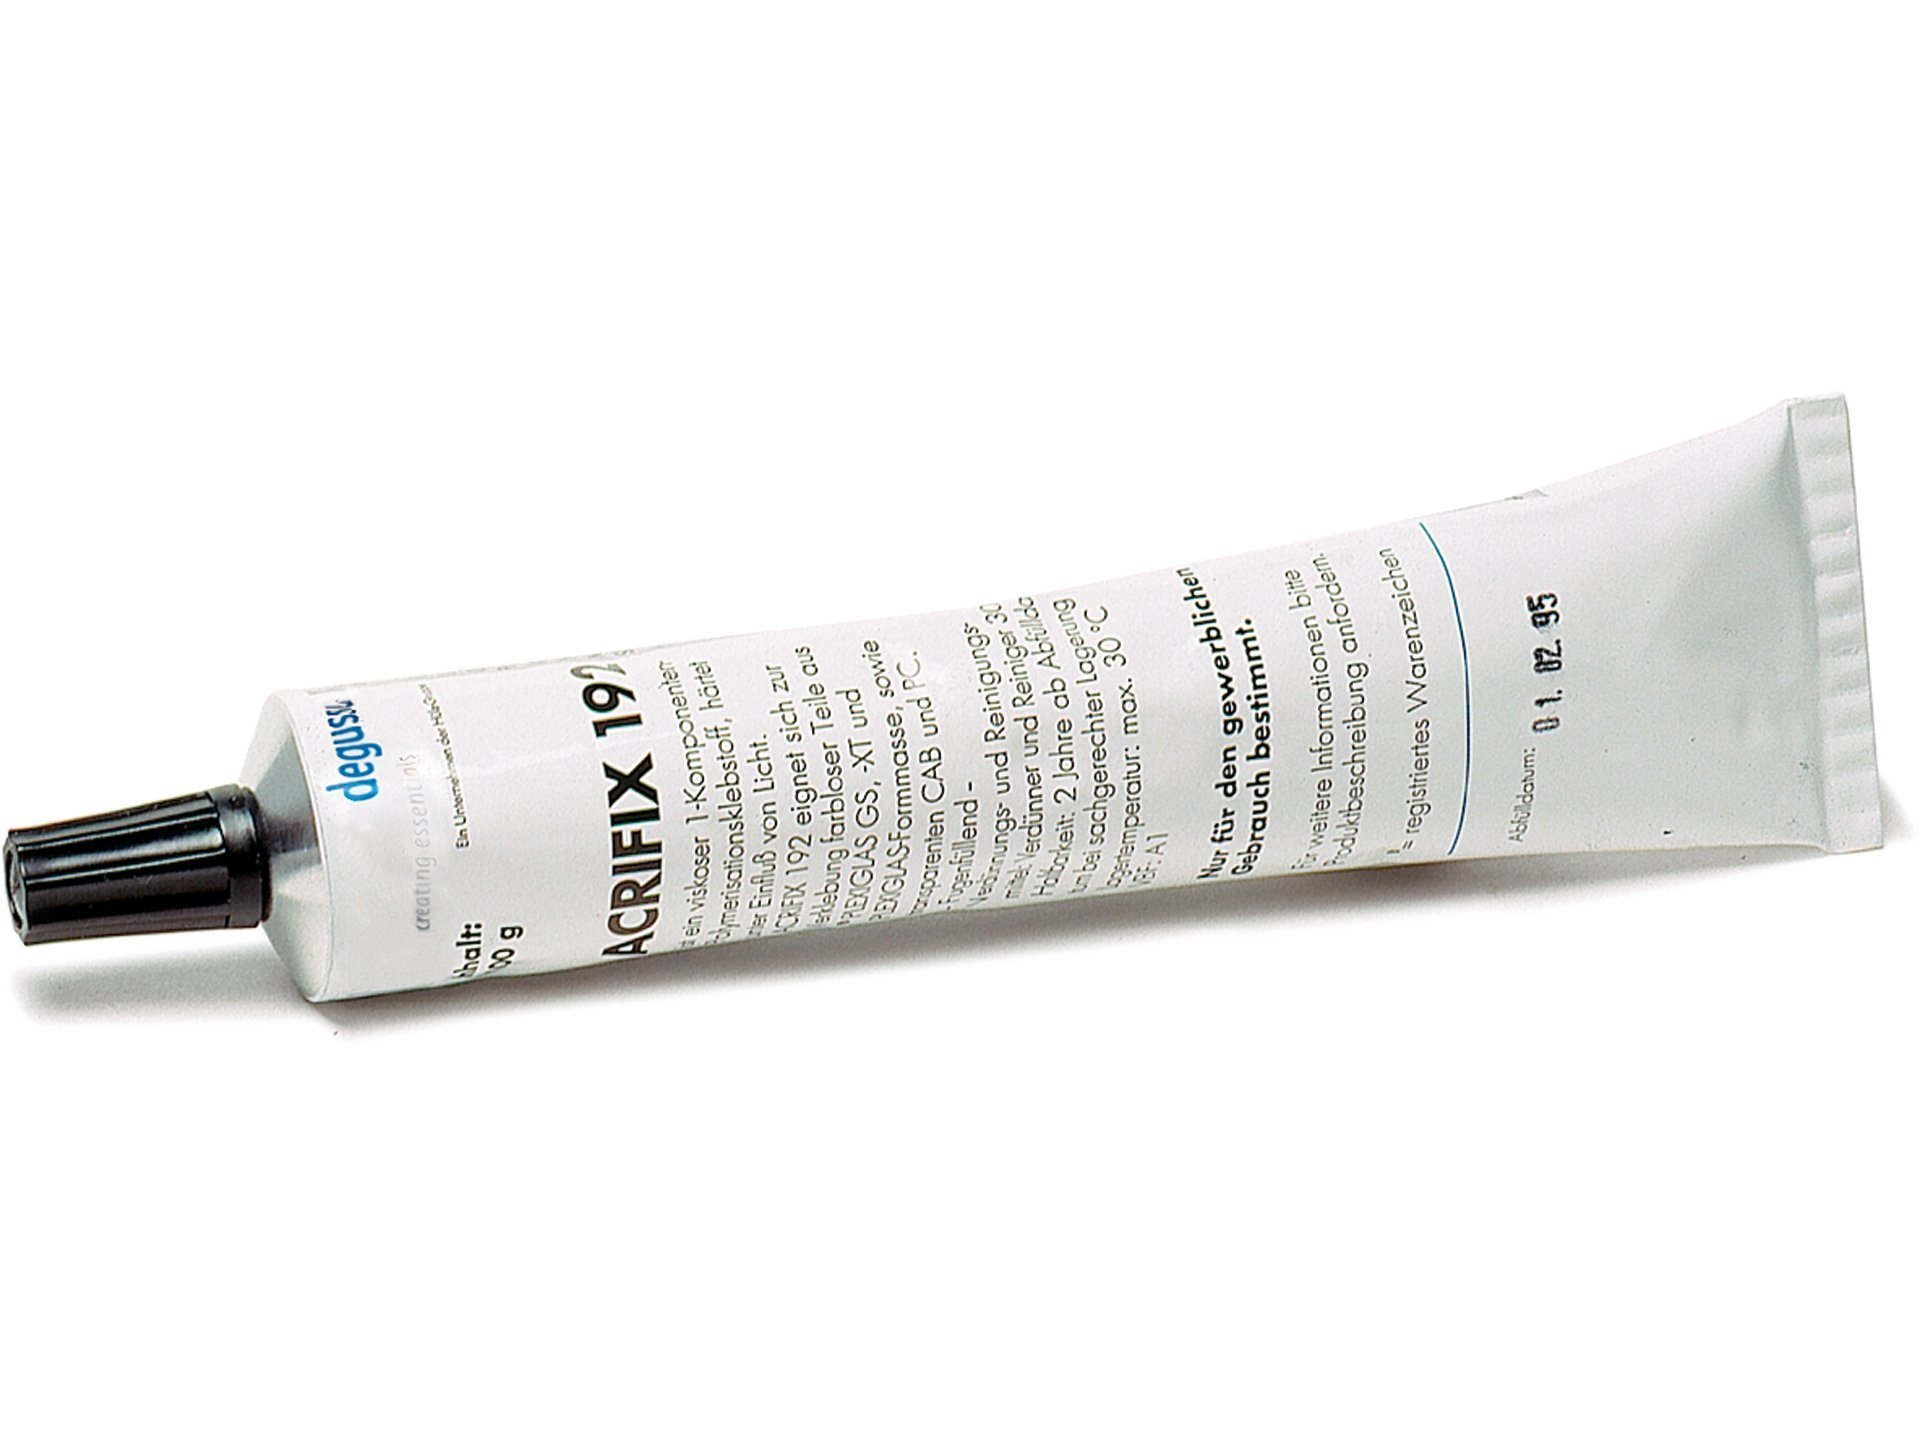 Super Acrifix 192 Acryl-Kleber jetzt online kaufen | Modulor OF83